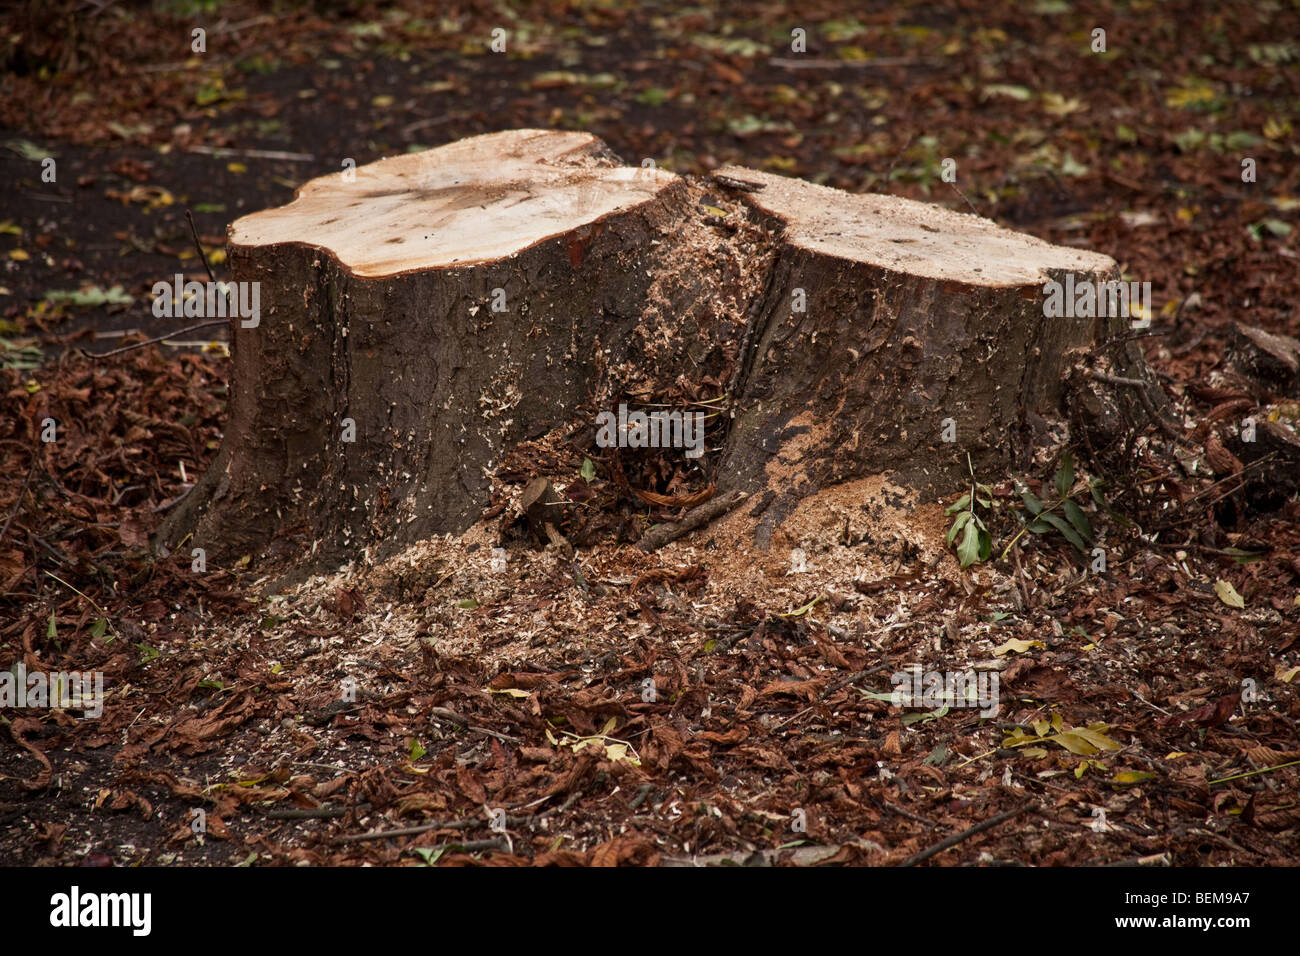 Tree stumps, Wanstead Park, London, England. - Stock Image